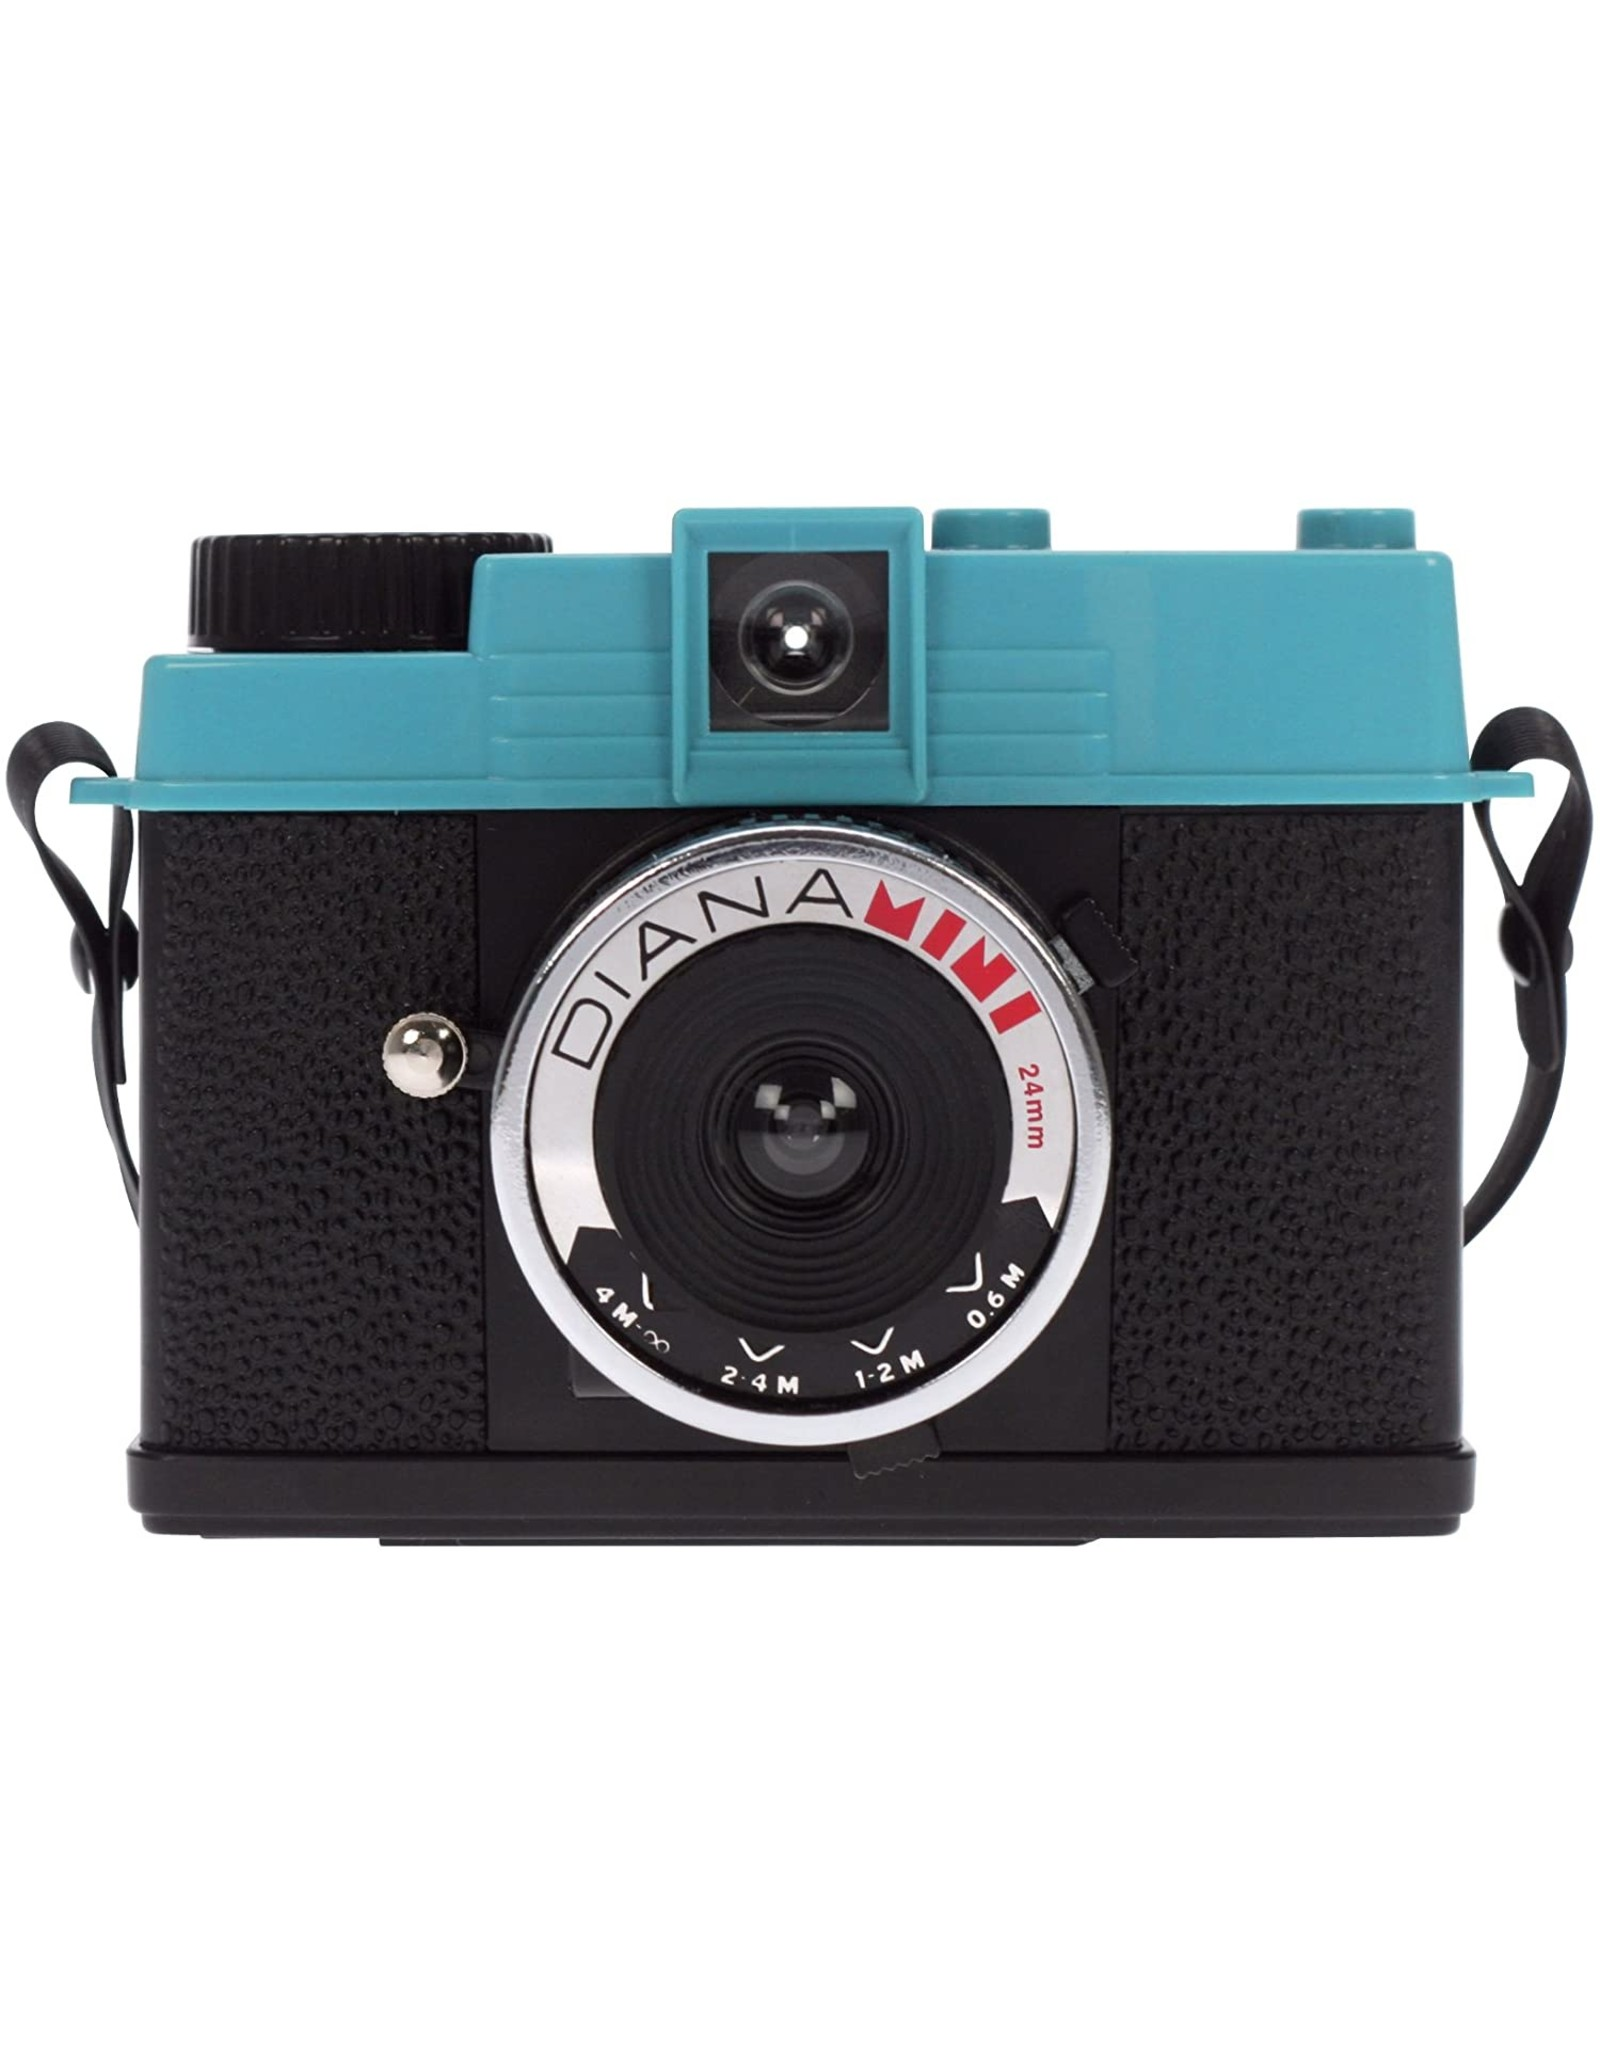 Lomography Diana Mini 35mm Camera (used)